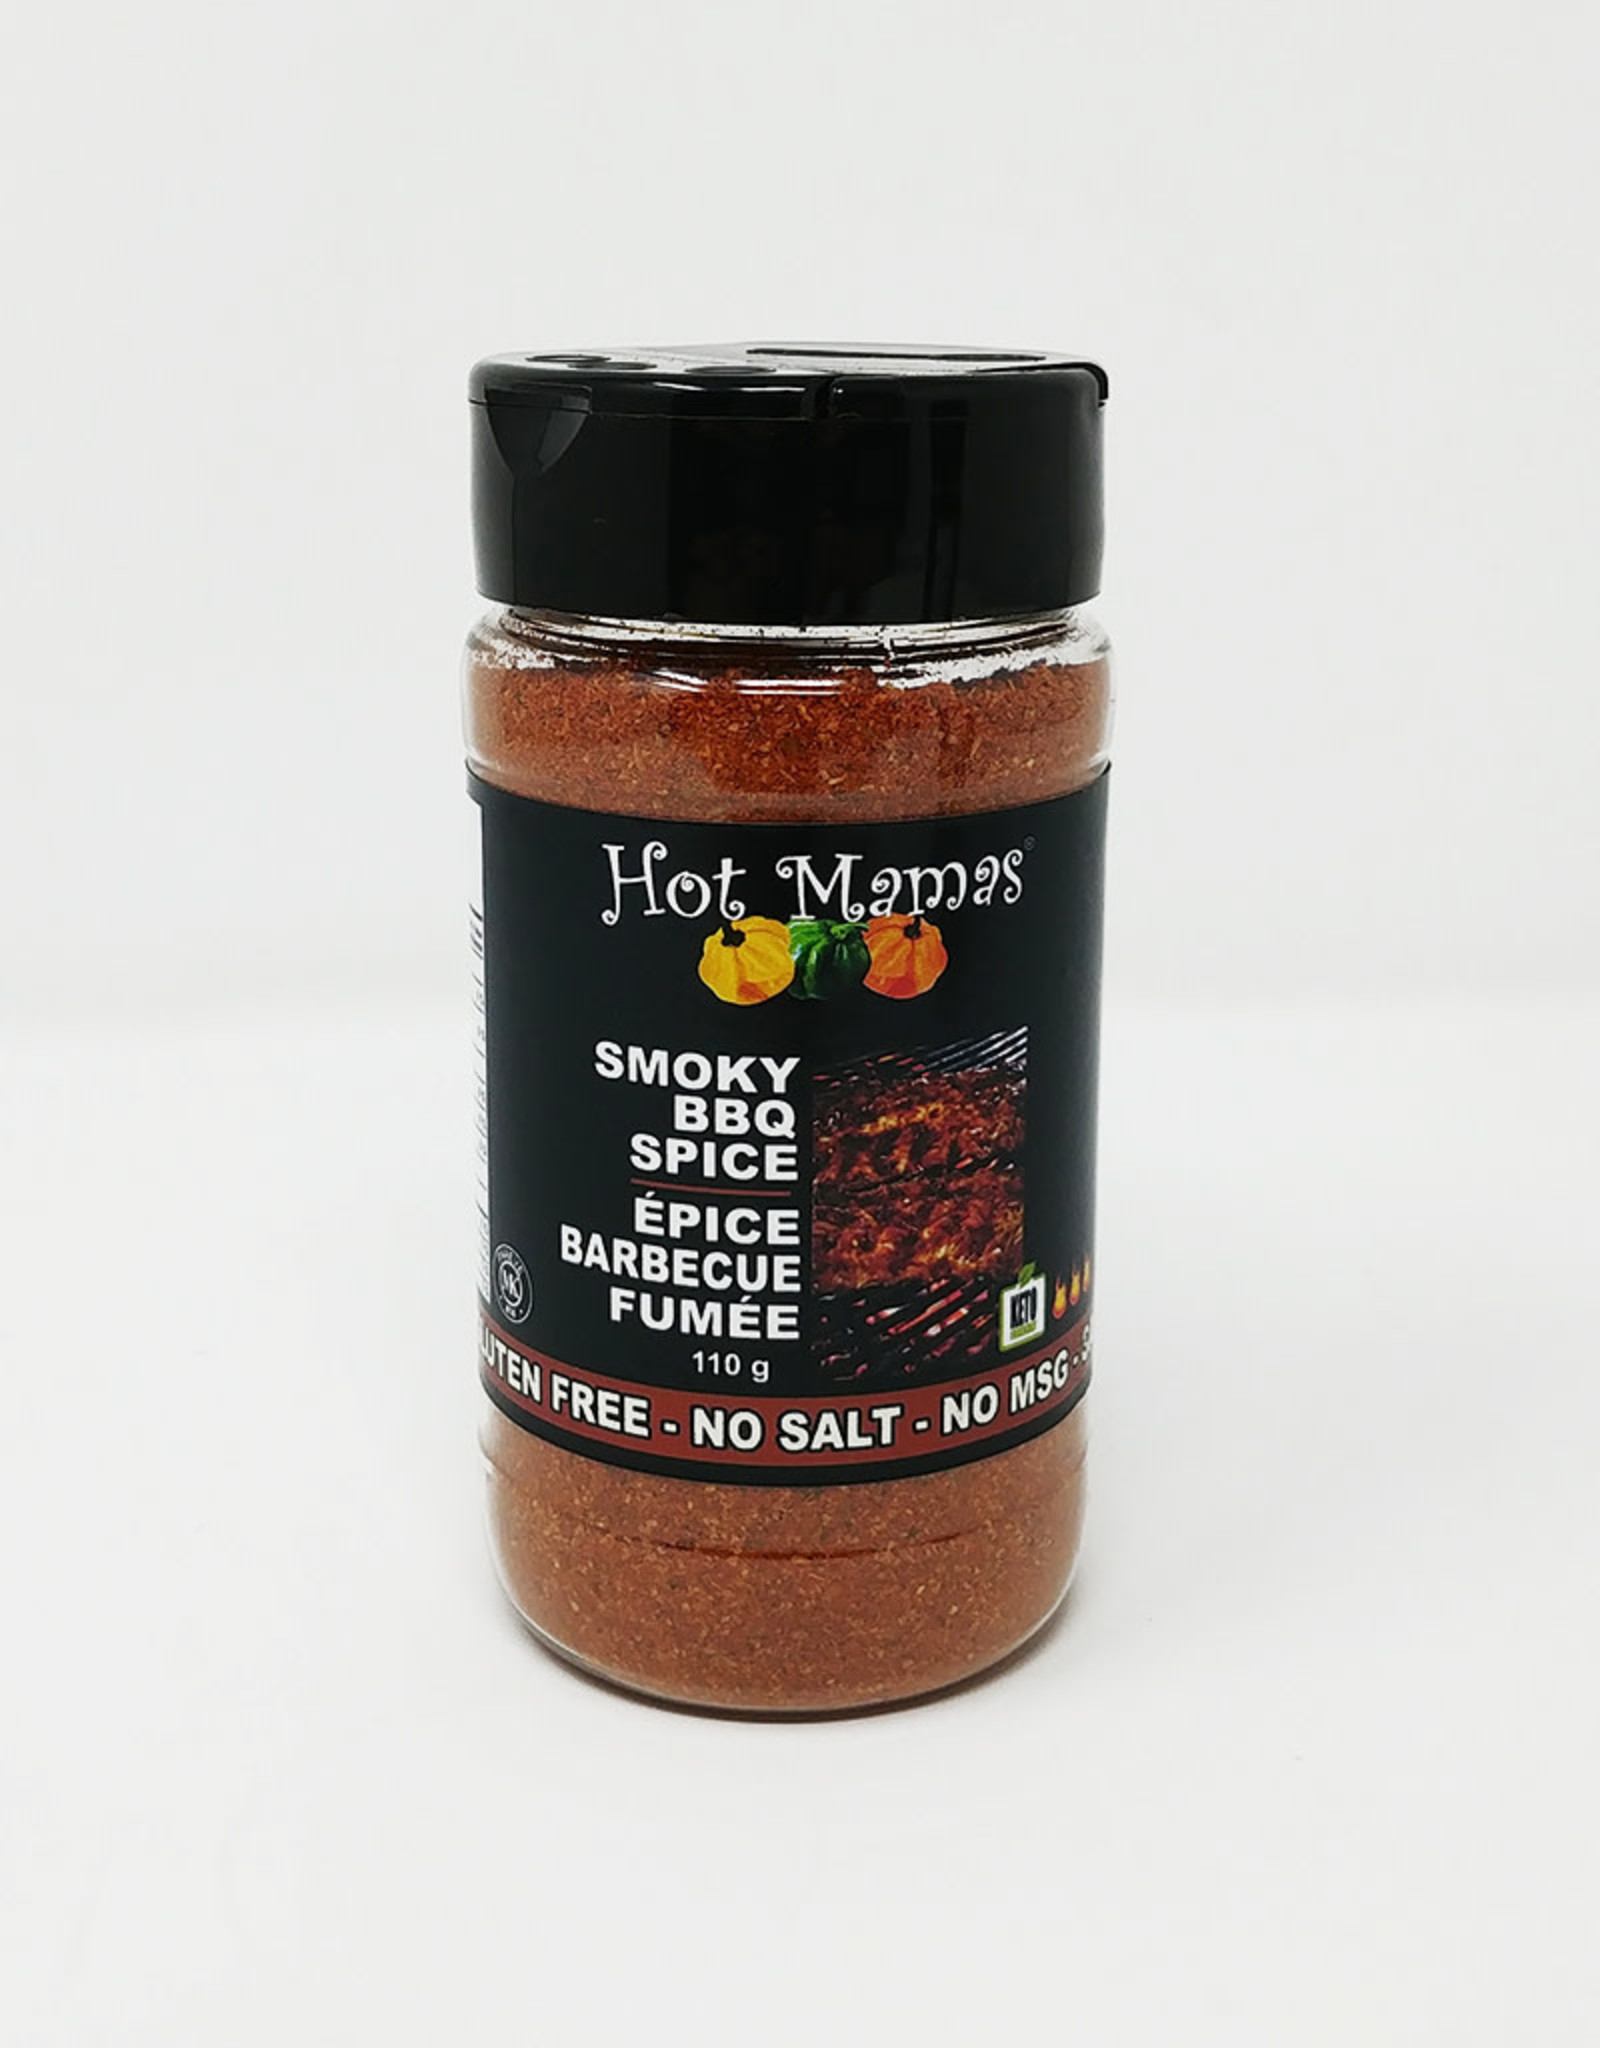 Hot Mamas Hot Mamas - Spice Mix, Smoky BBQ (110g)